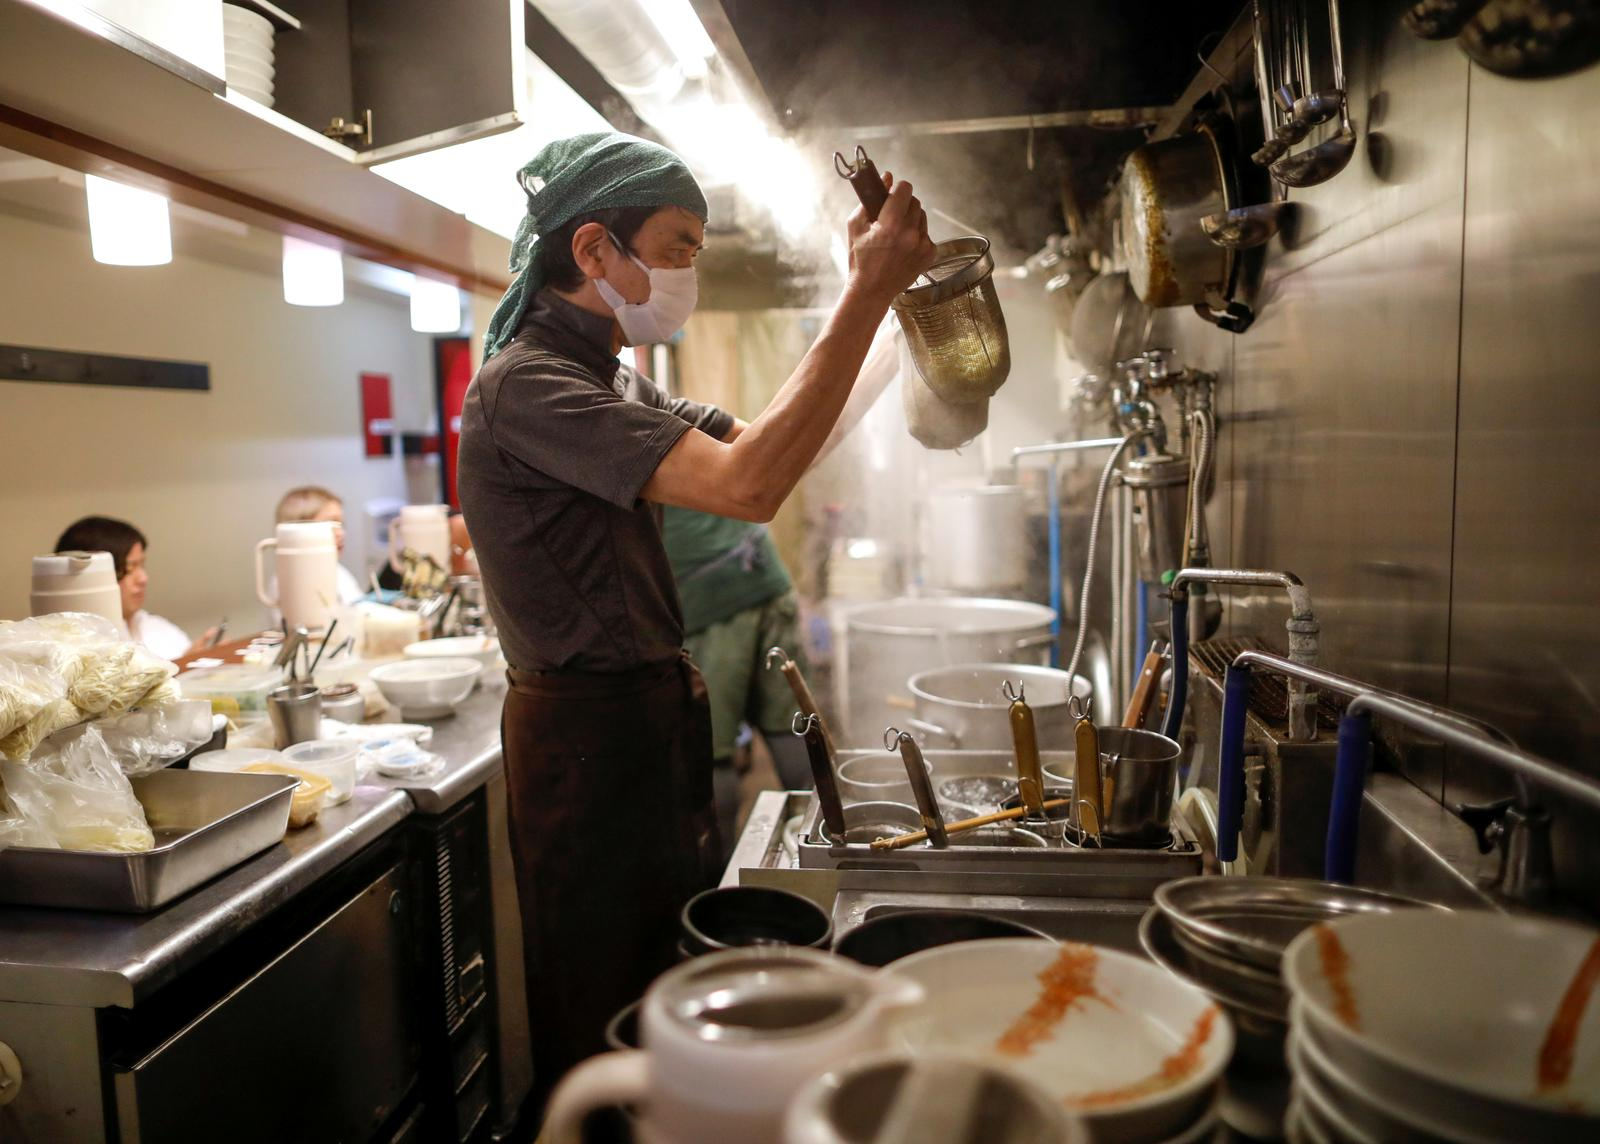 Sixty-year-old Yashiro Haga cooks ramen noodles at his noodle shop 'Shirohachi', amid the coronavirus disease (COVID-19) outbreak, in Tokyo, Japan November 20, 2020. Photo: Reuters